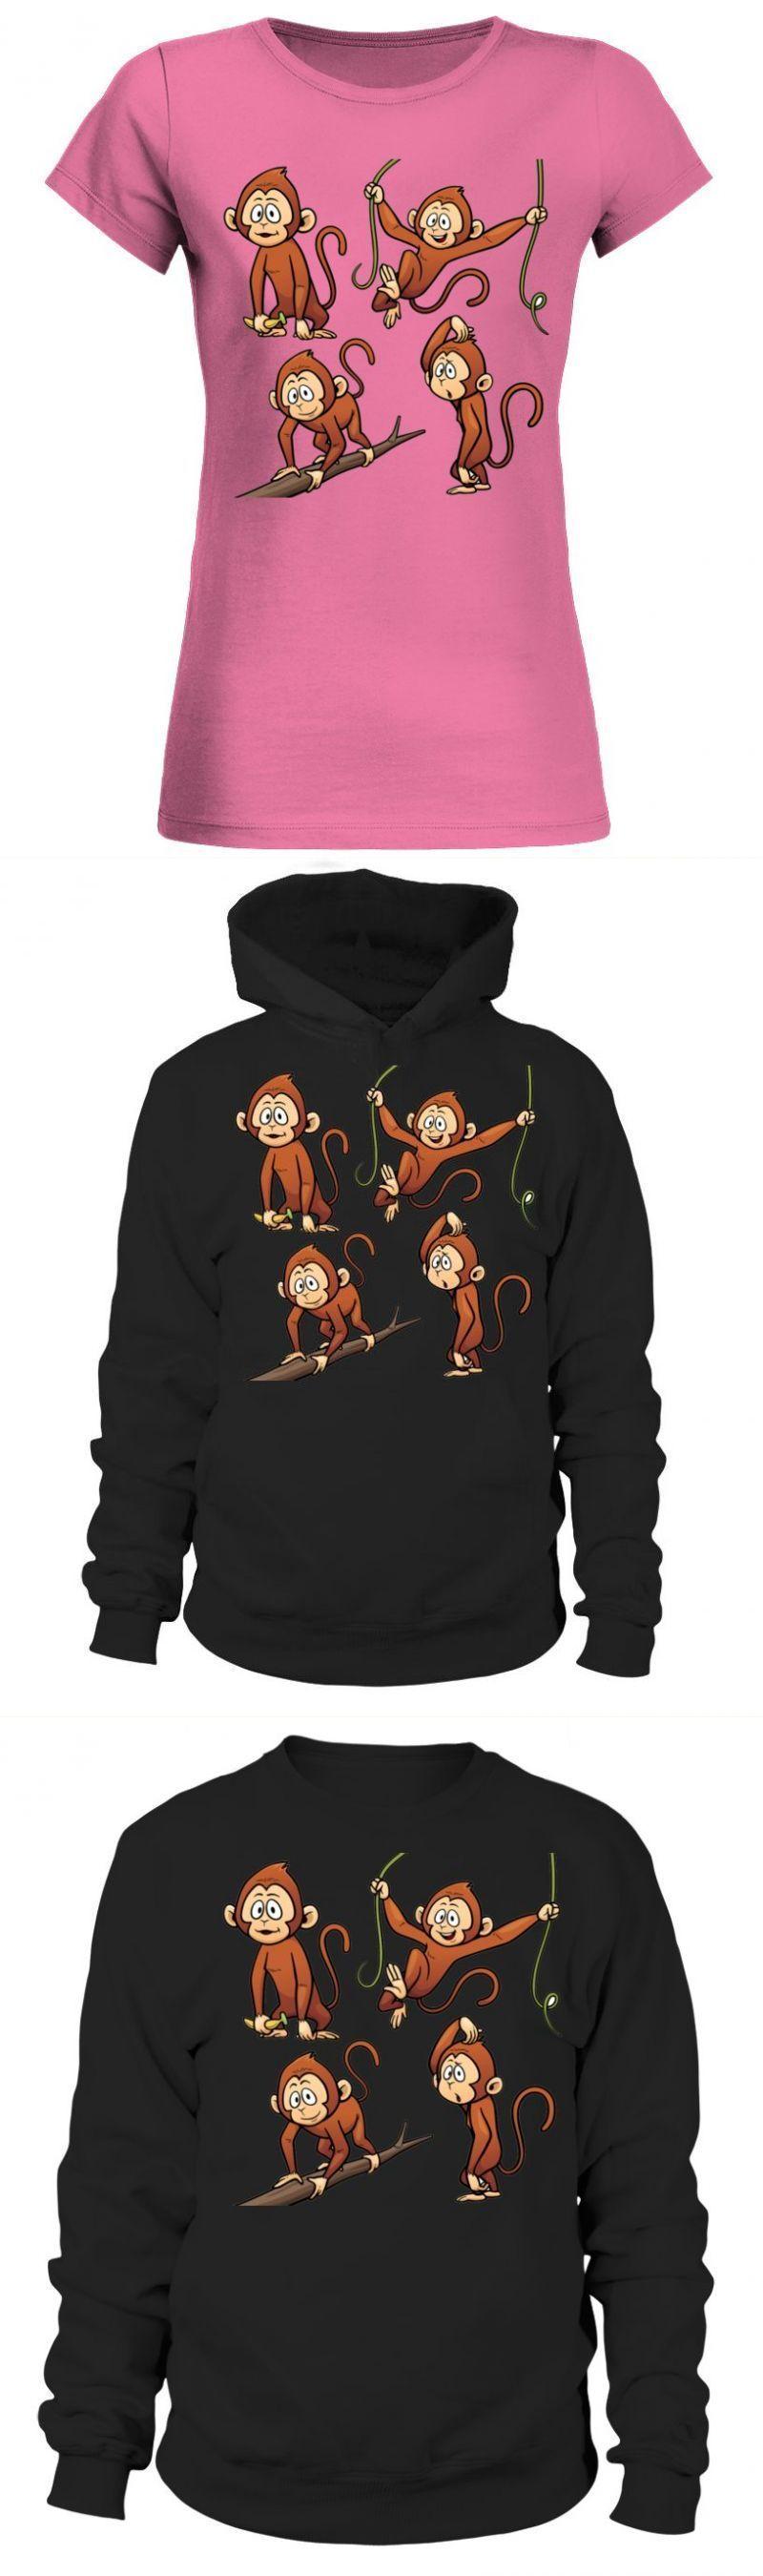 Artic monkeys t shirt women cartoon monkey character set gas monkey garage t shirt #gasmonkeygarage Artic monkeys t shirt women cartoon monkey character set gas monkey garage t shirt #artic #monkeys #shirt #women #cartoon #monkey #character #set #gas #garage #arctic #round #neck #t-shirt #woman #hoodie #unisex #sweatshirt #gasmonkeygarage